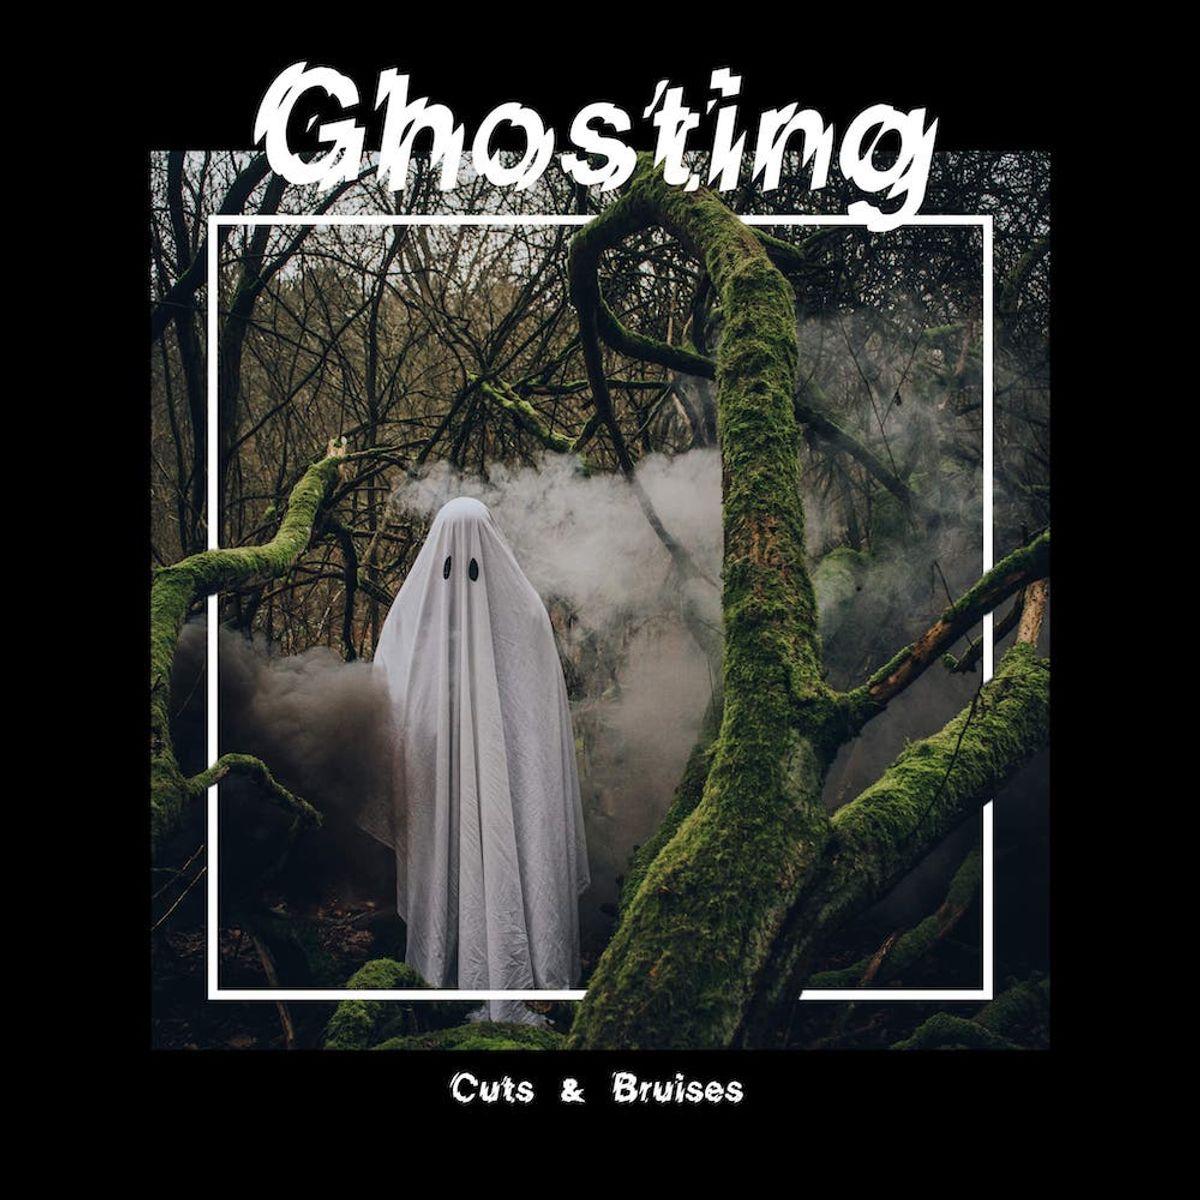 Cuts & Bruises - Ghosting